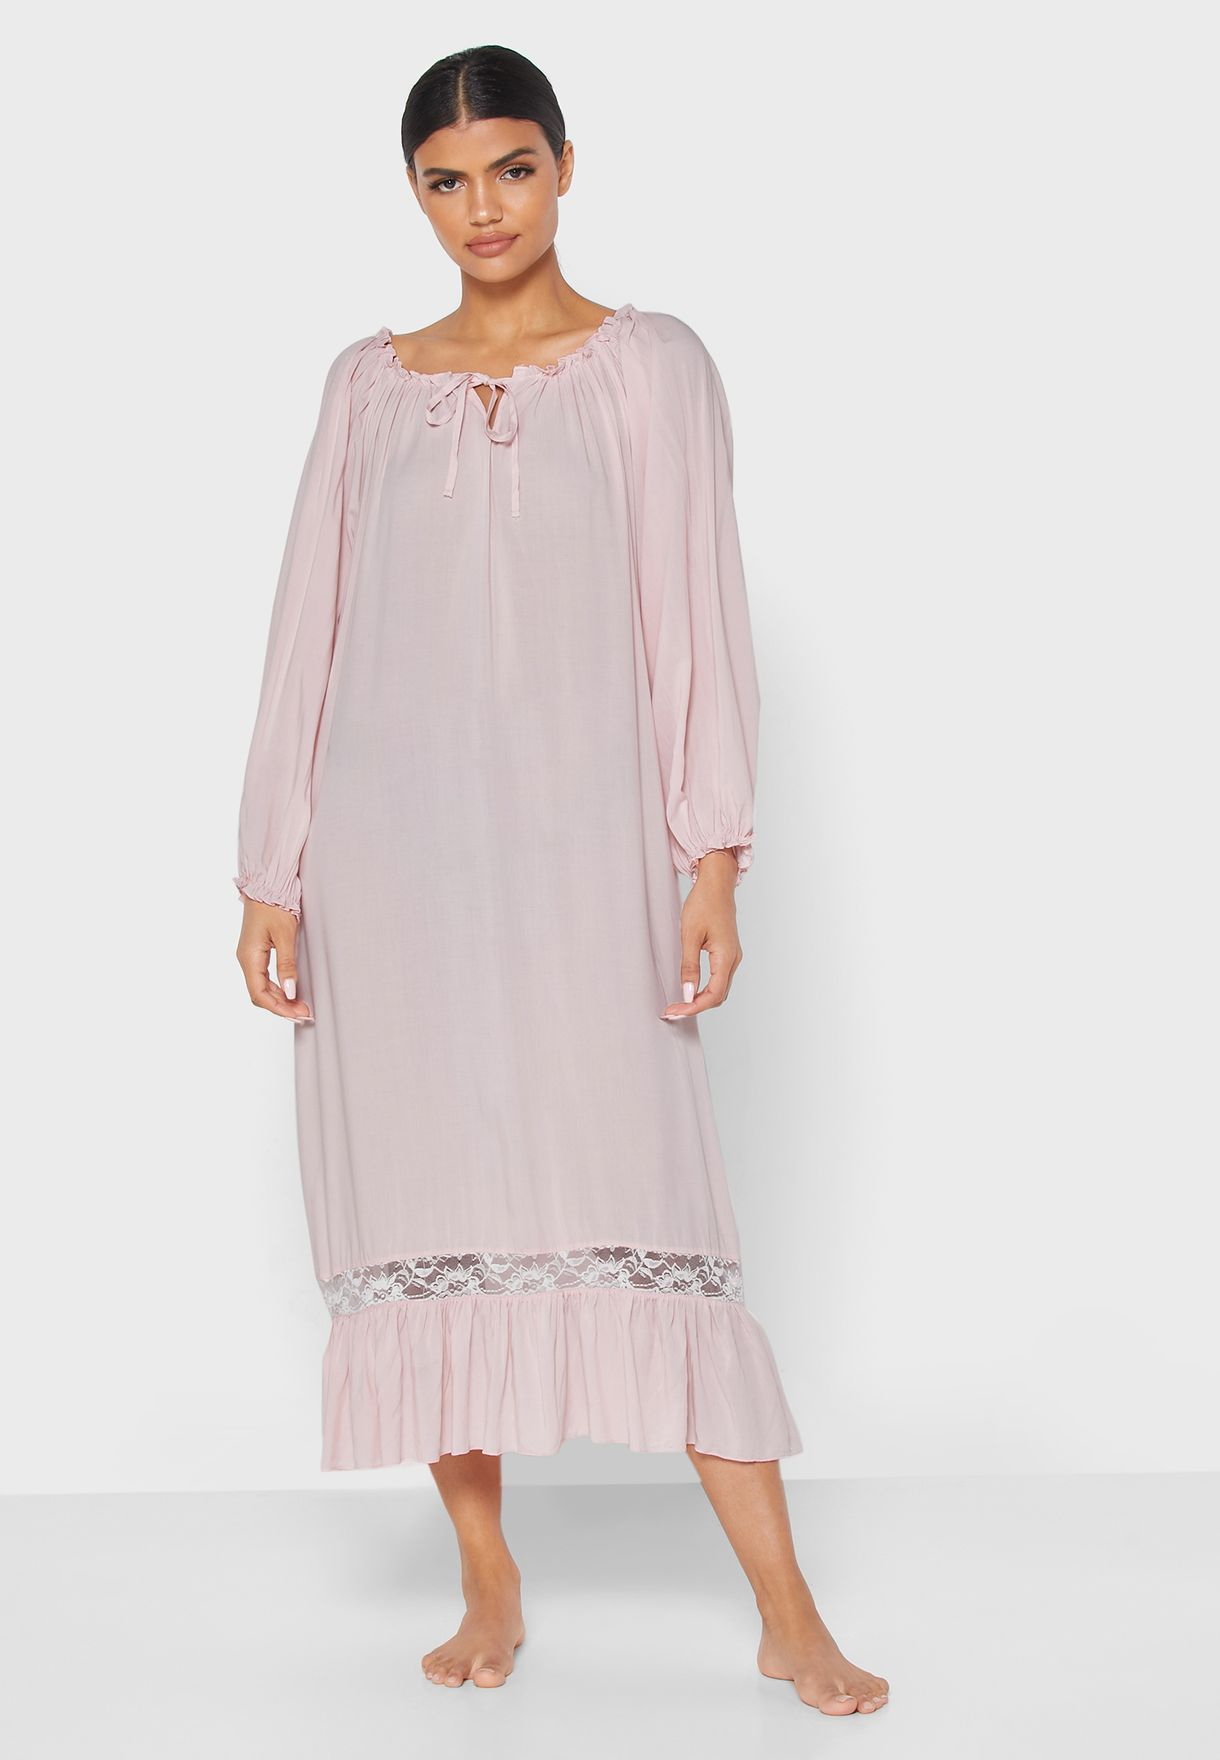 Ruffle Trim Nightdress